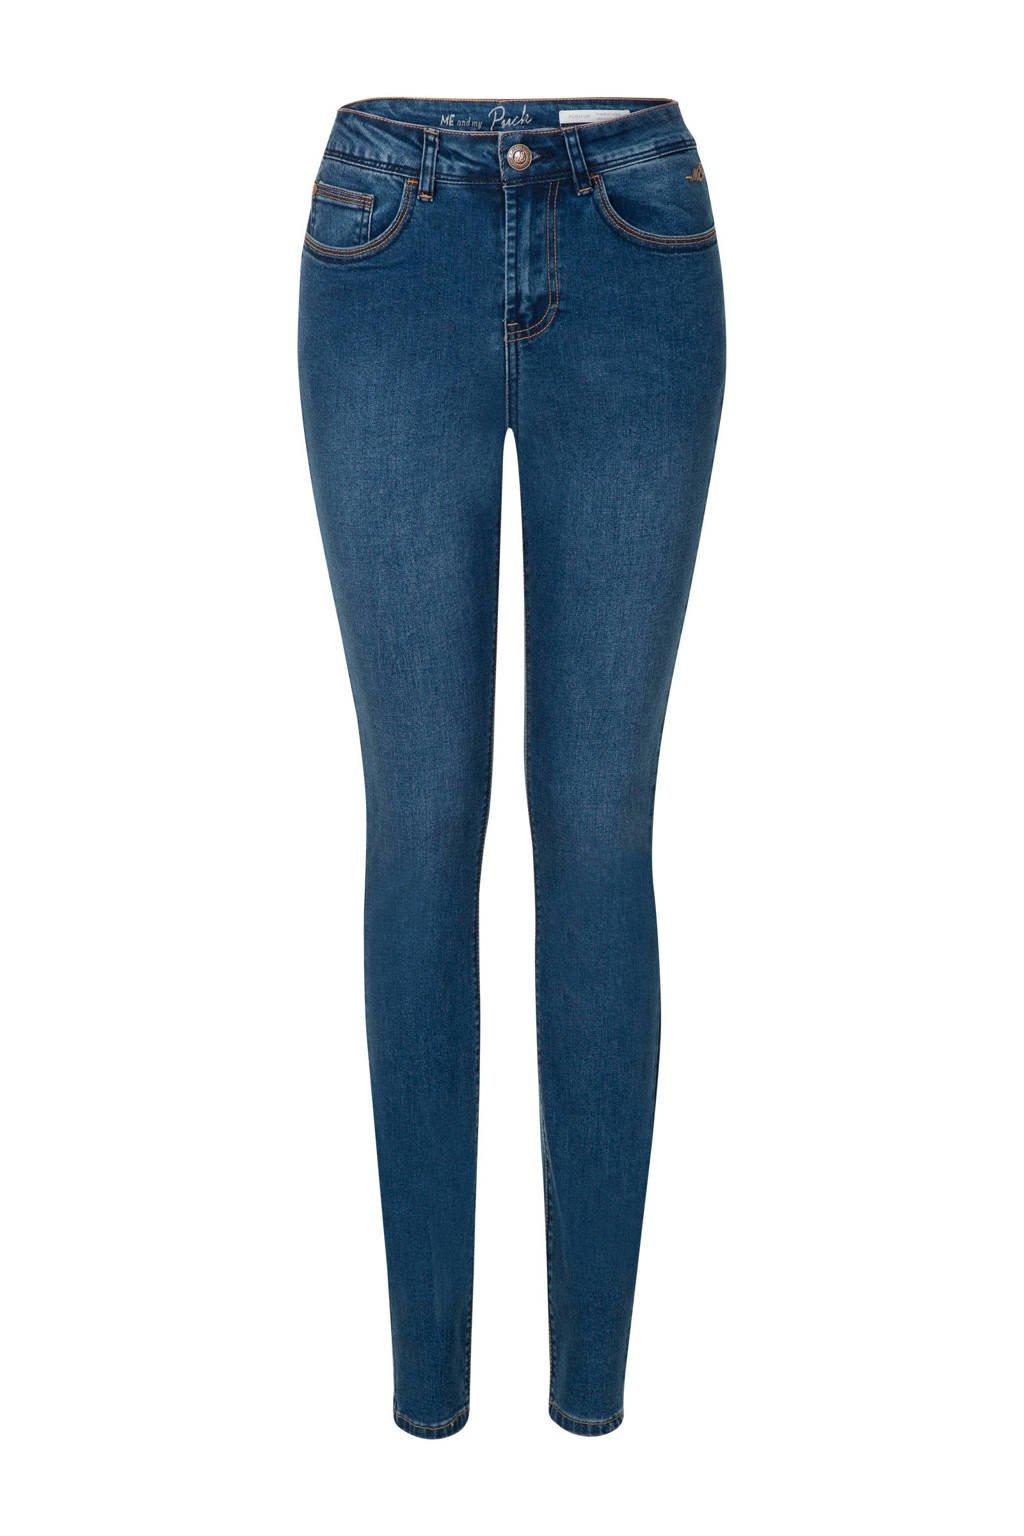 Miss Etam Lang skinny jeans Puck 36 inch blauw, Blauw